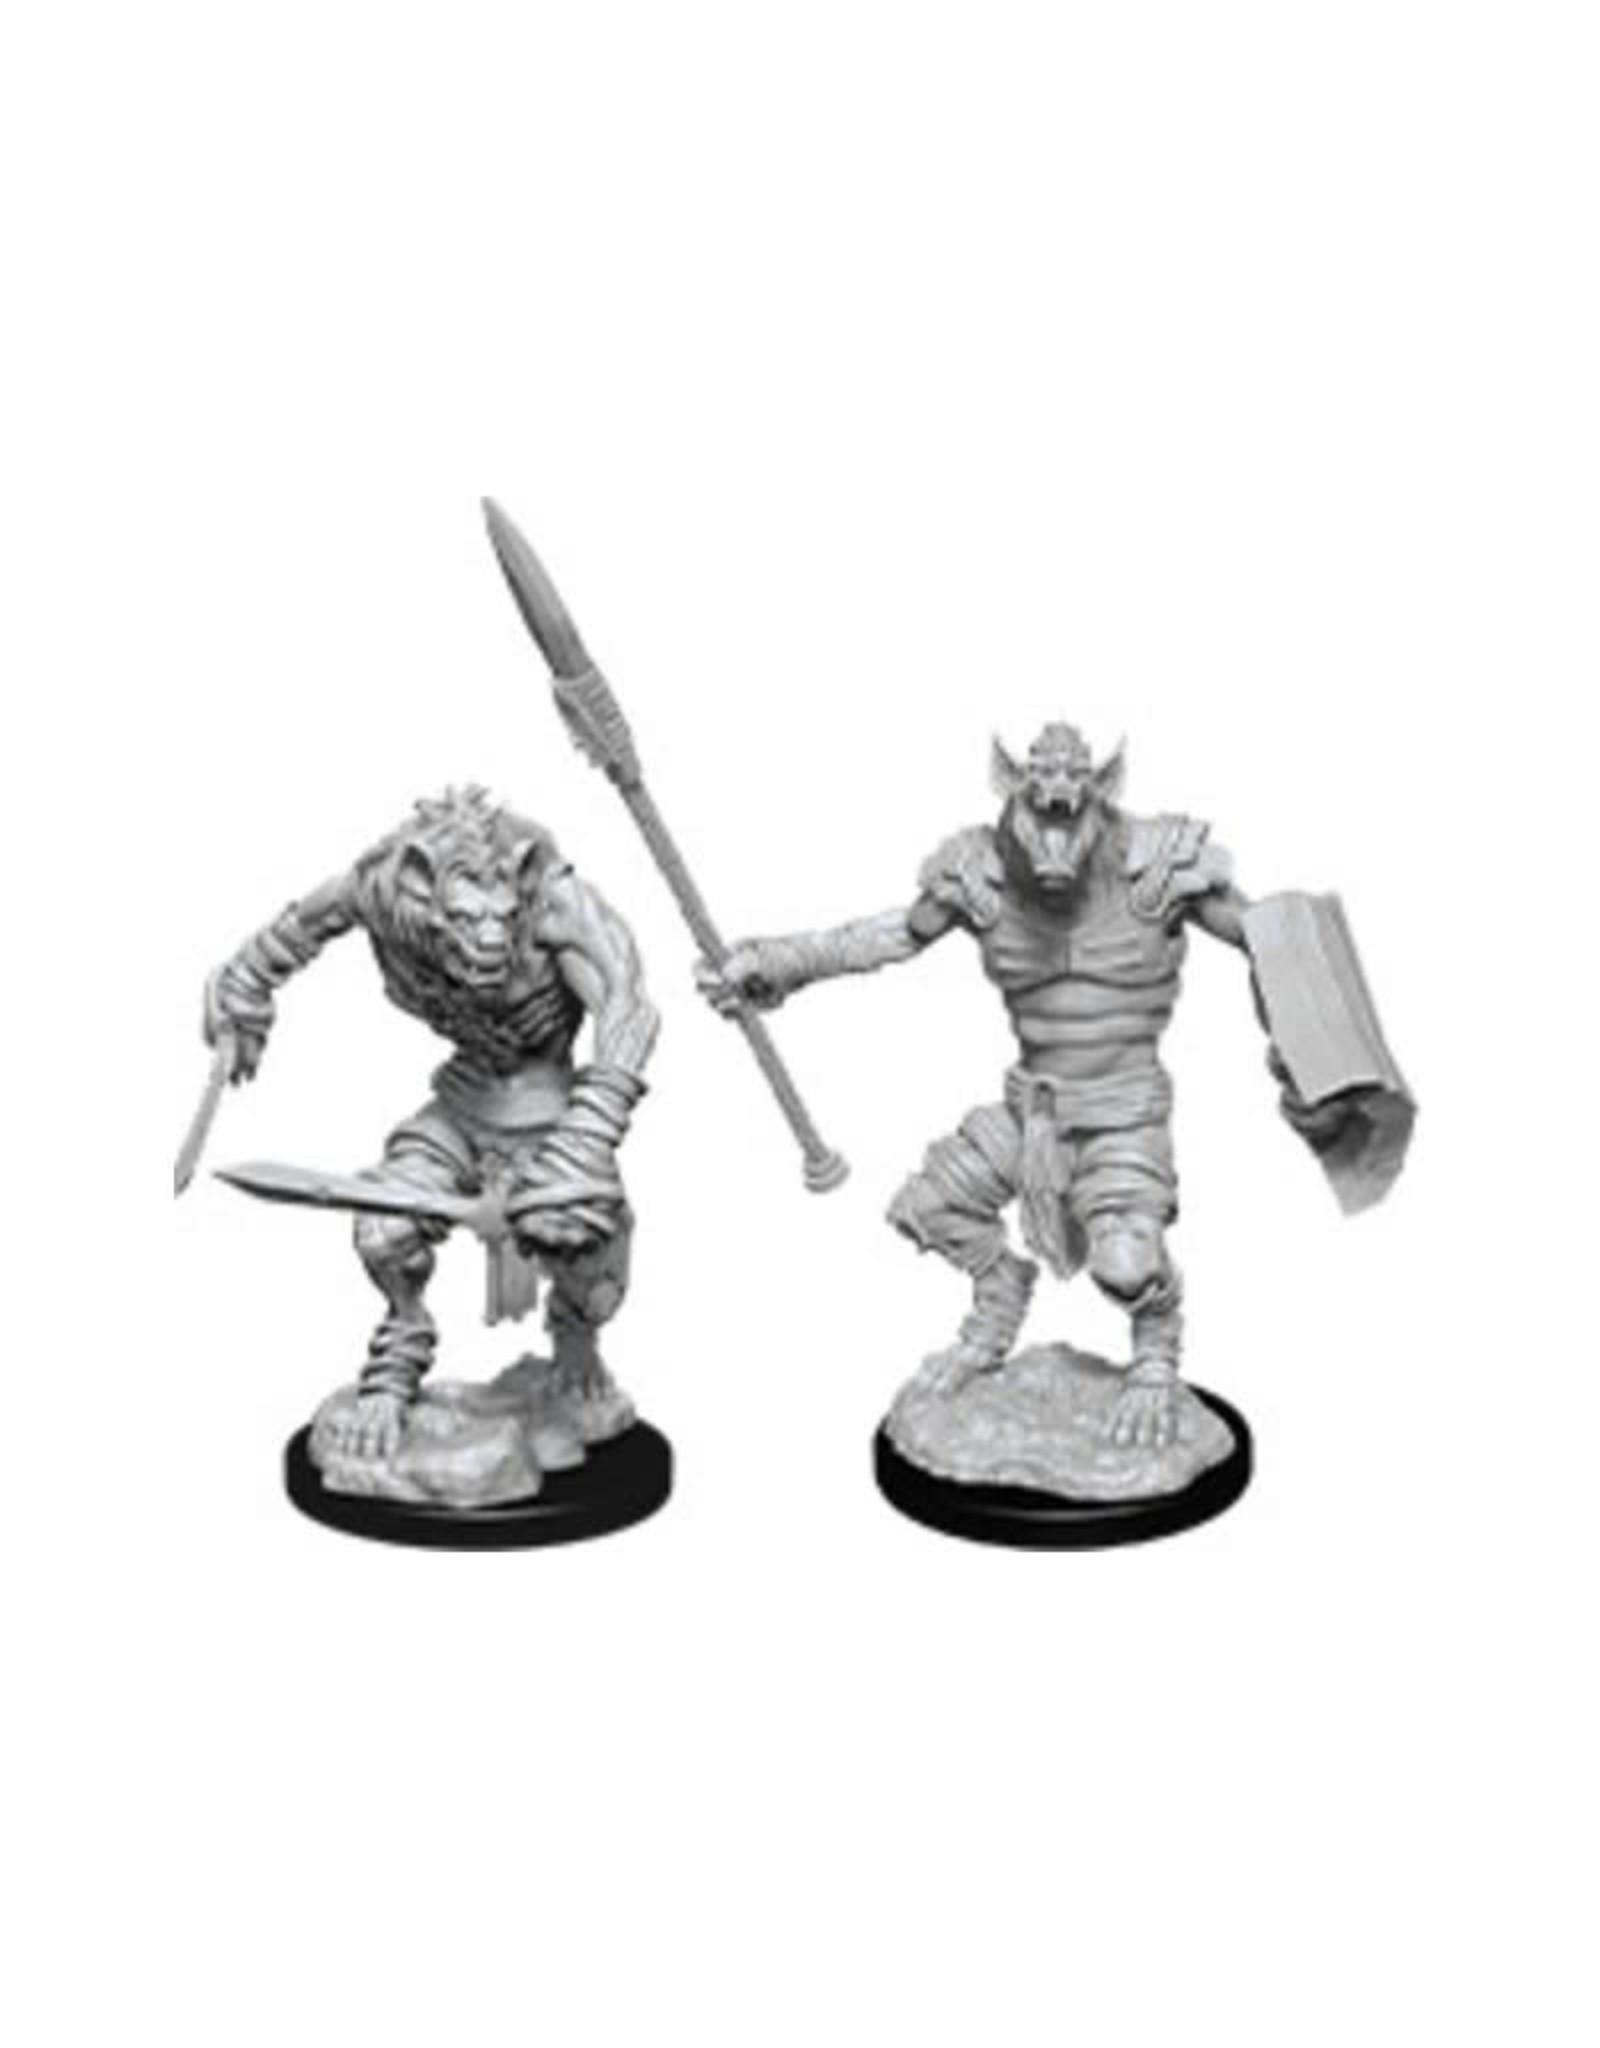 Wizkids D&D Unpainted Minis: Gnoll & Gnoll Flesh Gnawer